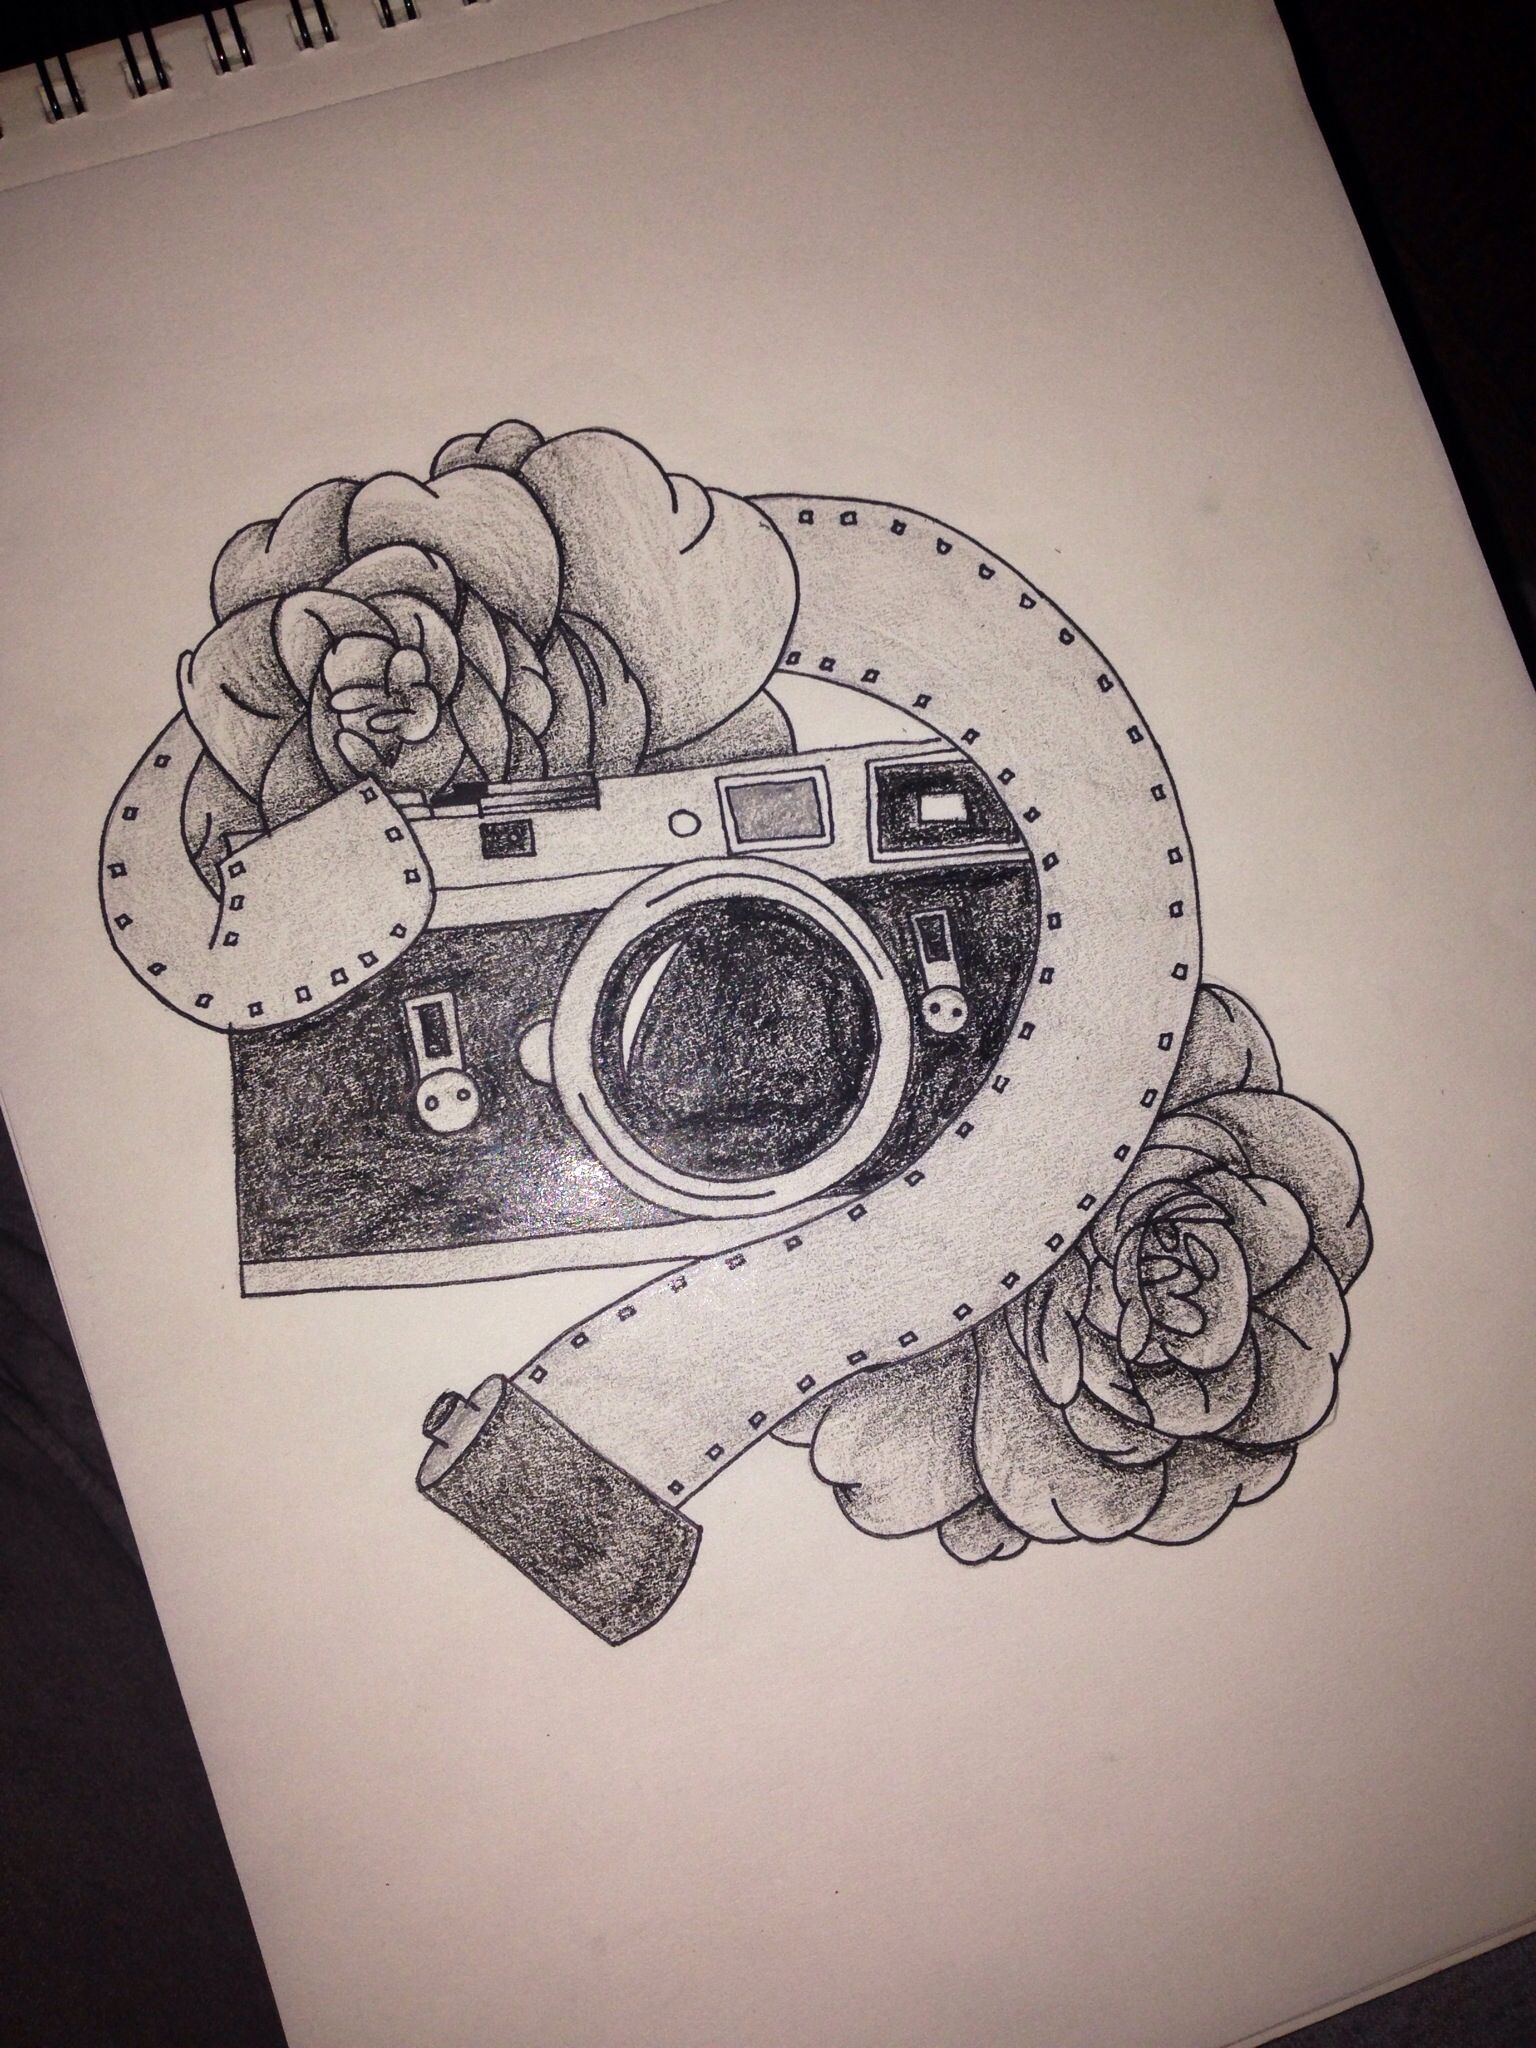 6b15302bf5233 Camera fine rose tattoo design | ink & designs. | Camera tattoos ...